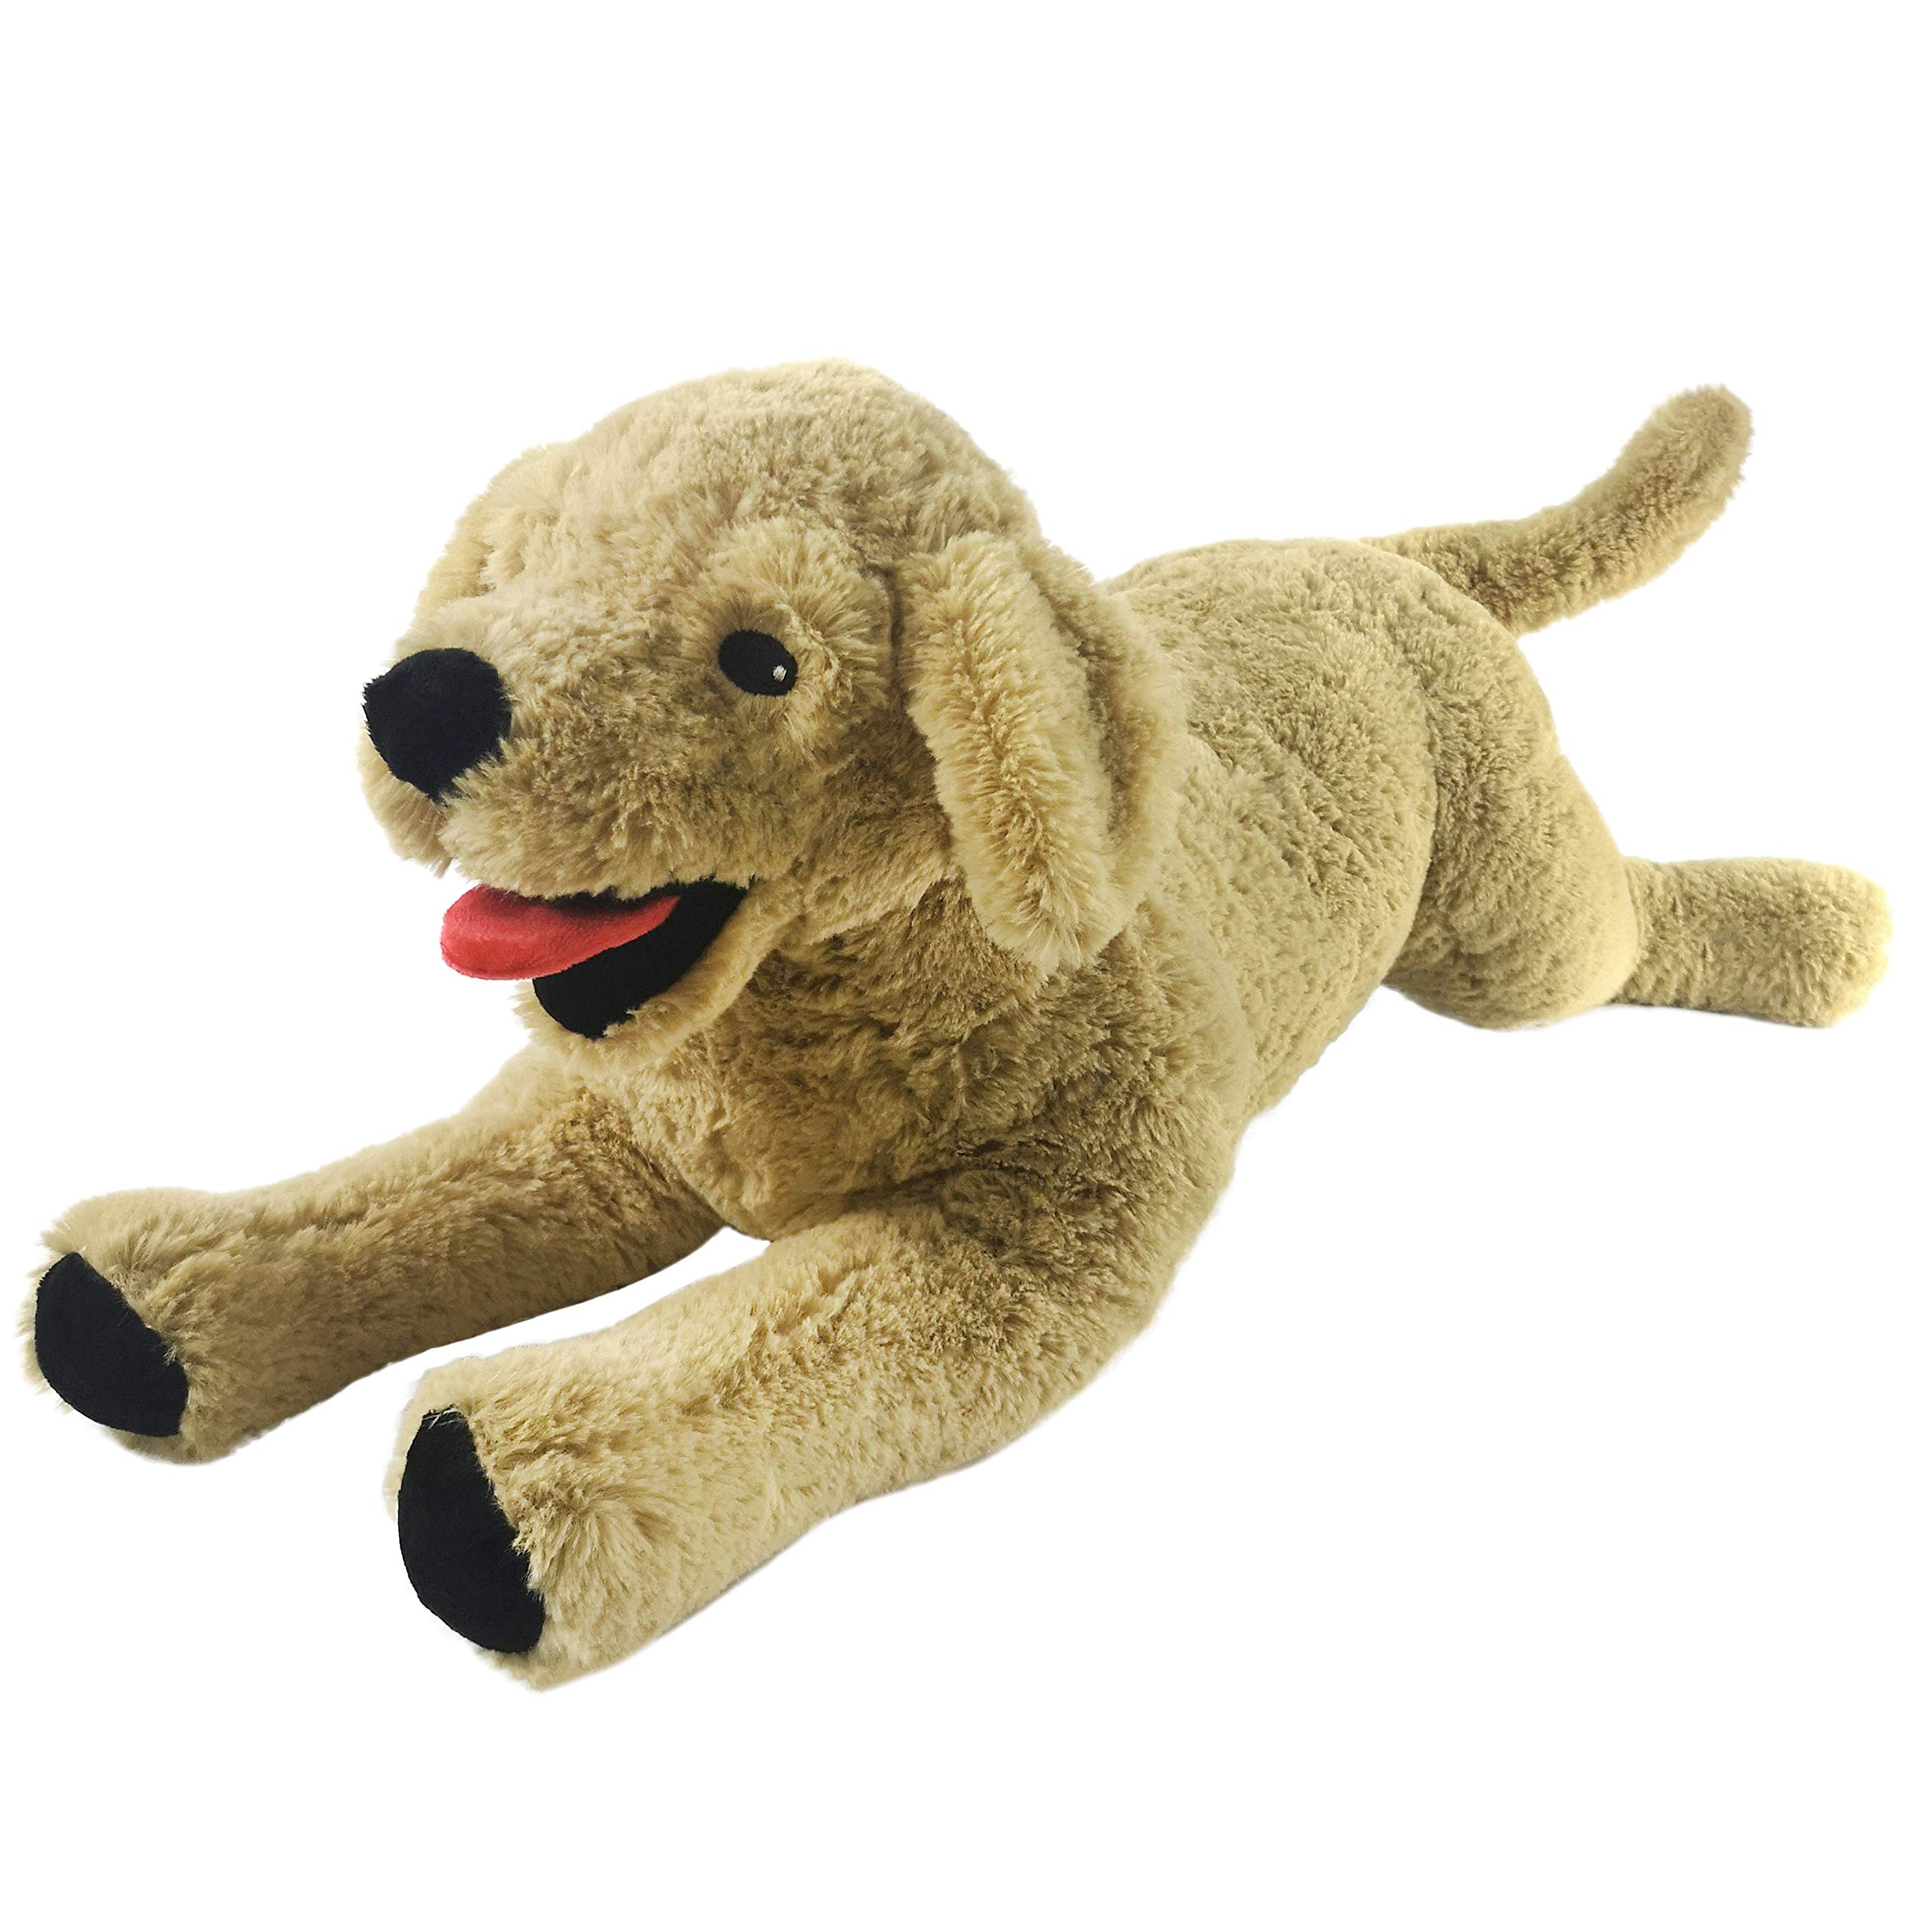 Houwsbaby Large Plush Golden Retriever Stuffed Puppy Pillow Pet Soft Dog Floppy Puppy Toy Cuddly Gift for Kids Boys Girls Birthday, Brown, 21''